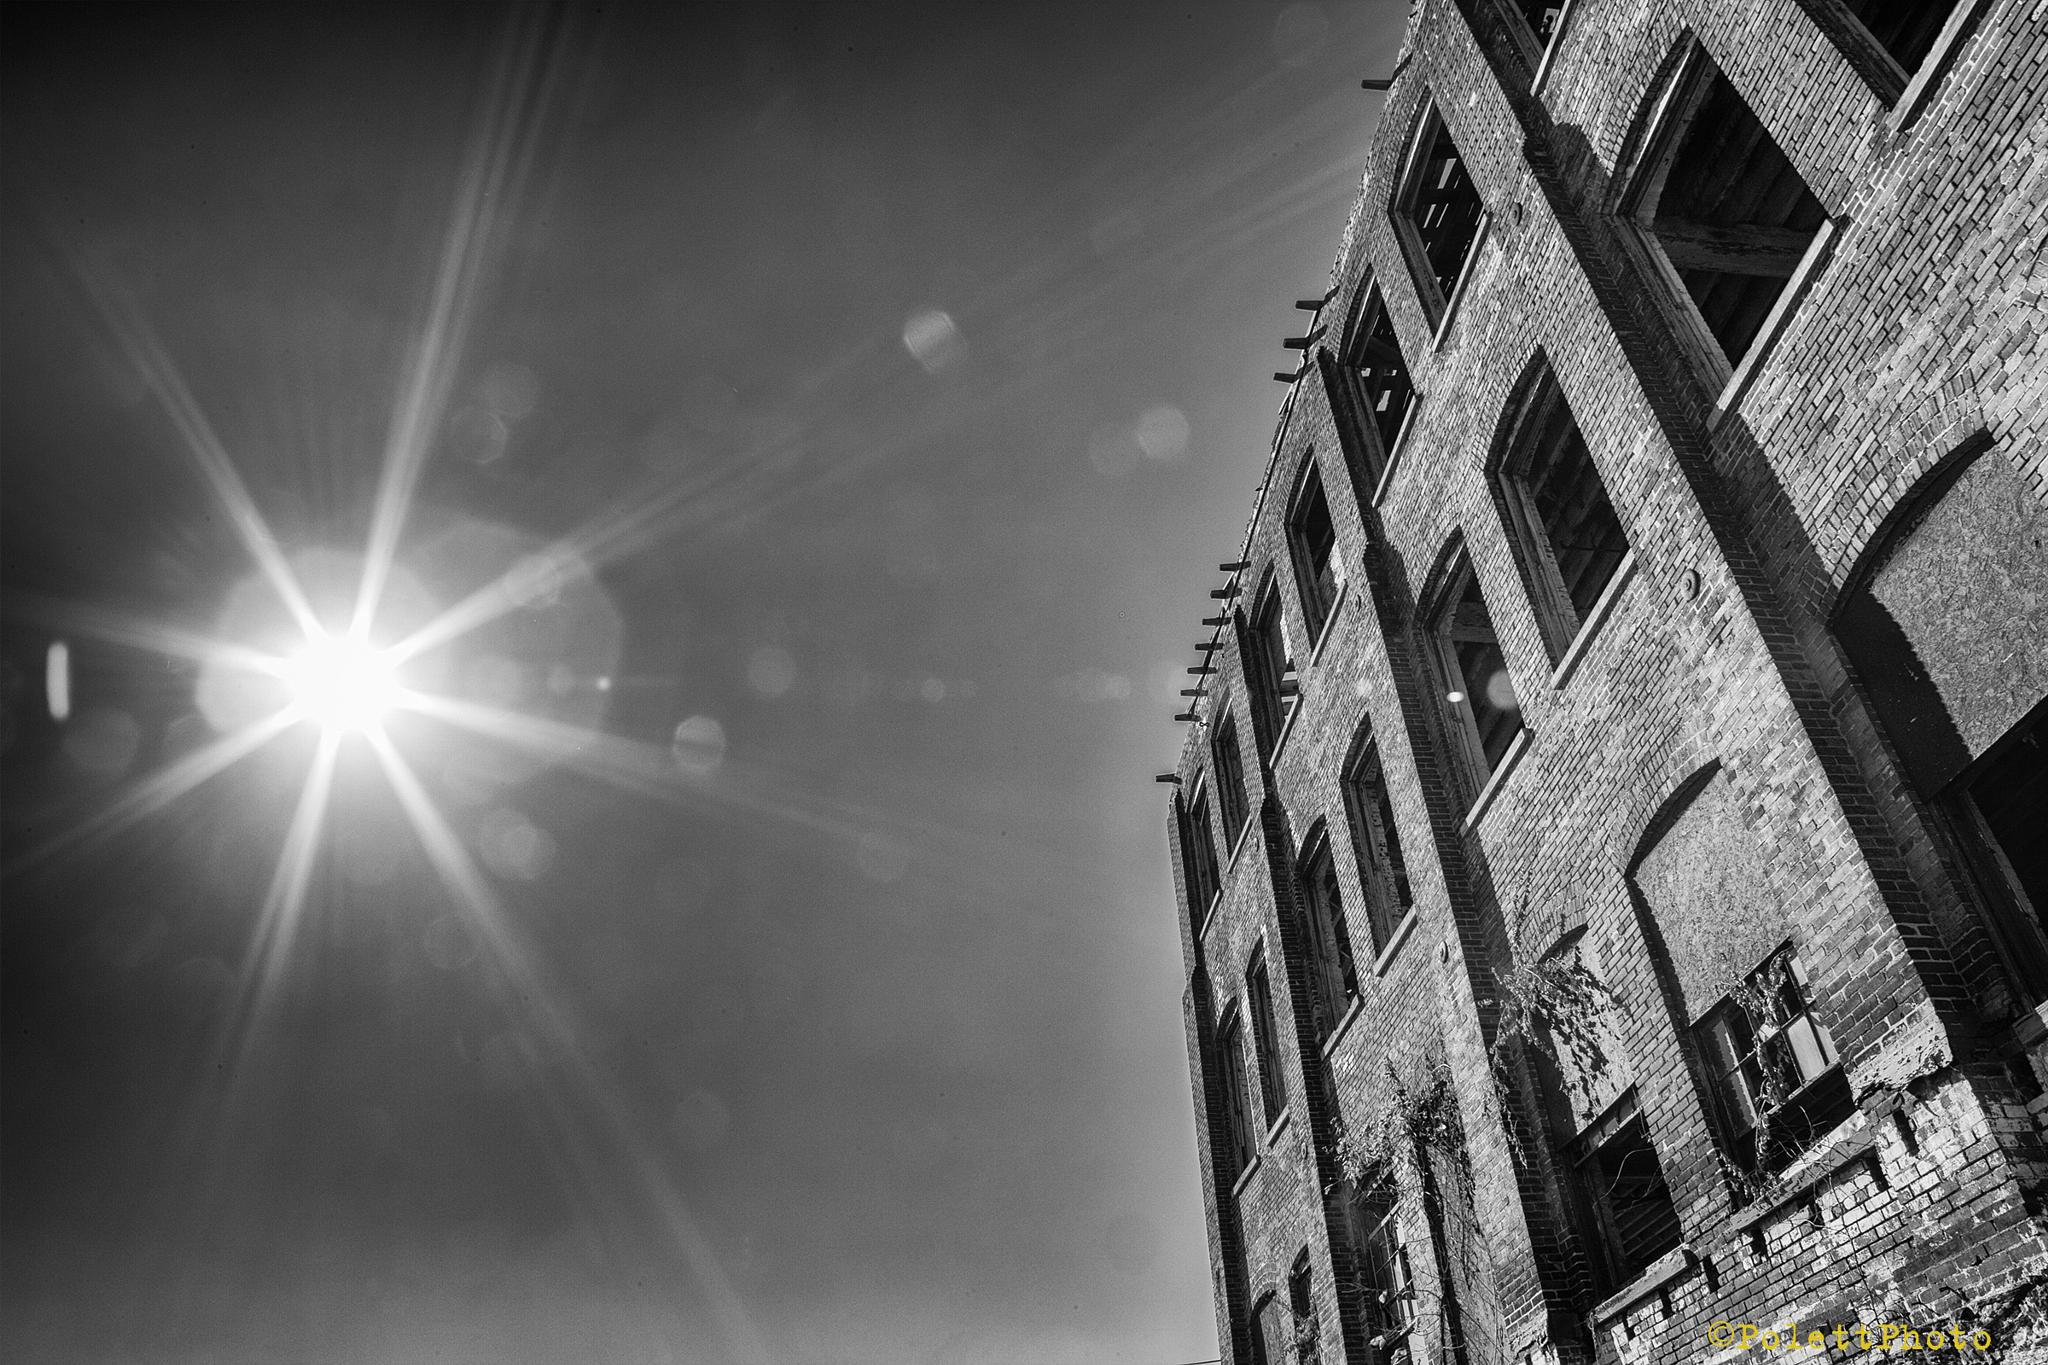 Windows 3 by Polettphoto